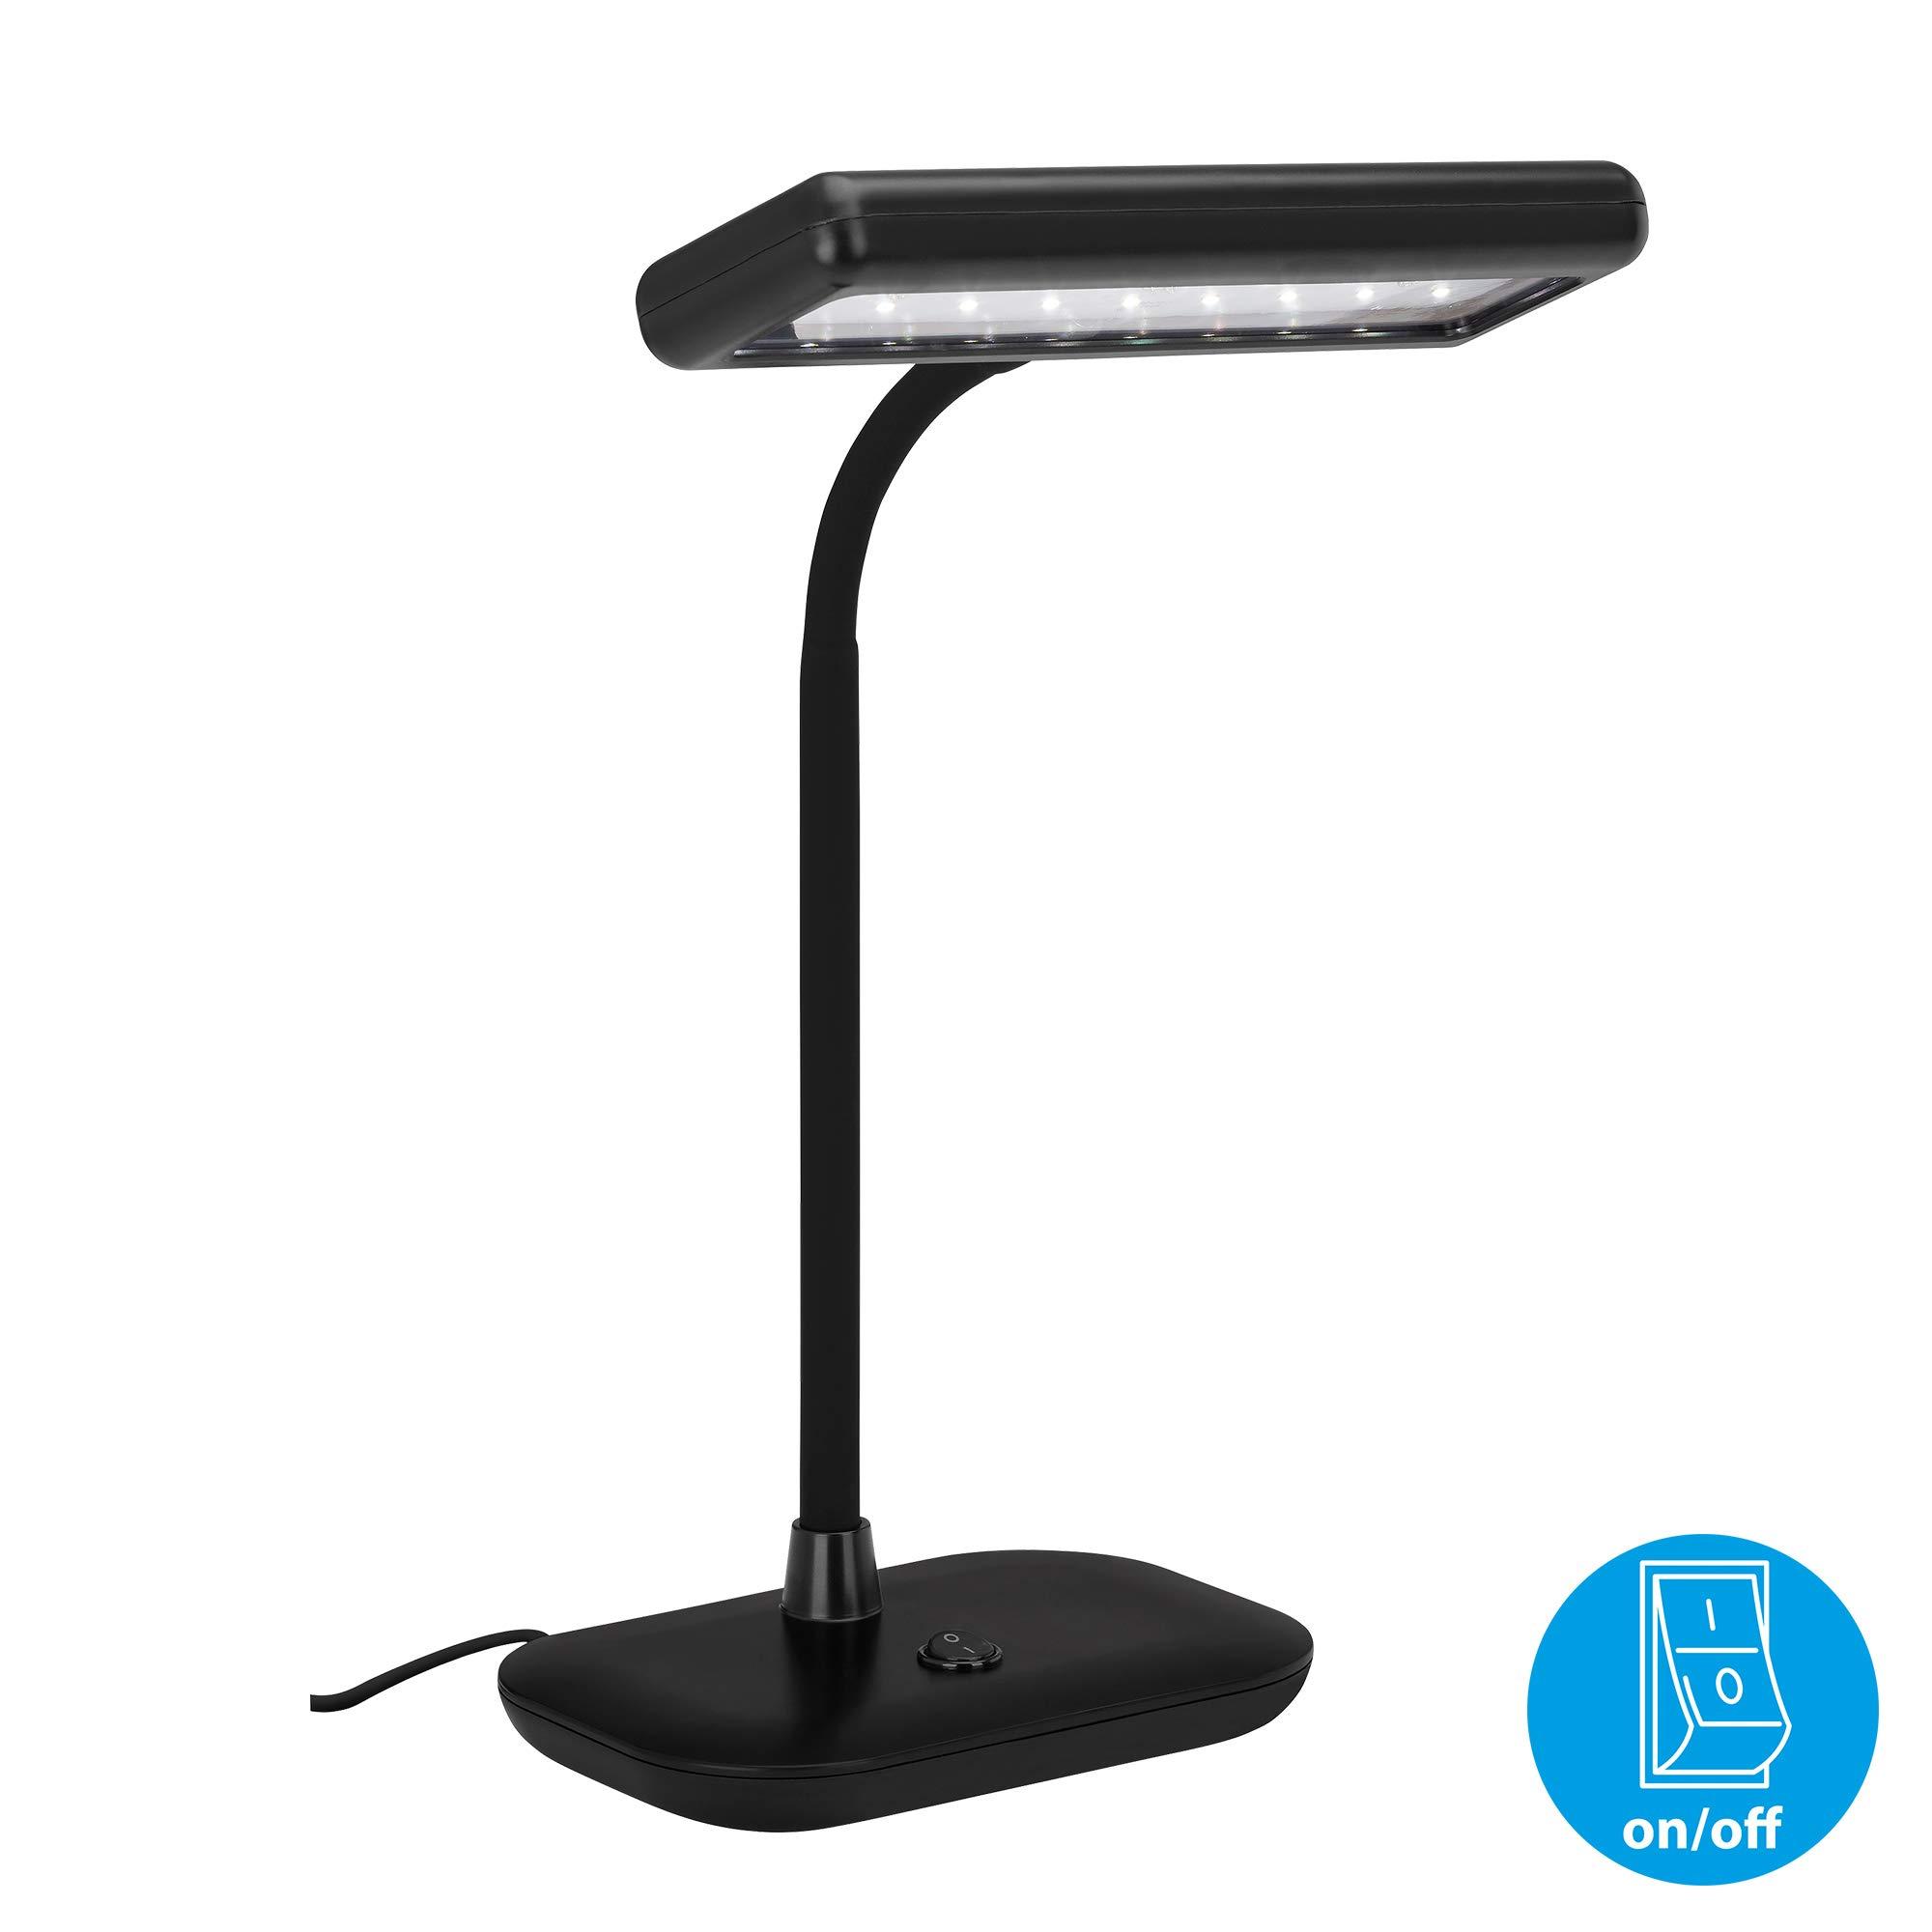 Briloner Leuchten LED 台灯,日光灯 6000 开尔文,800 流明,7.5 瓦,包含倾斜开关,灯颈可旋转和旋转,黑色,440 x 230 x 120 毫米(高x长x宽),7.5 W